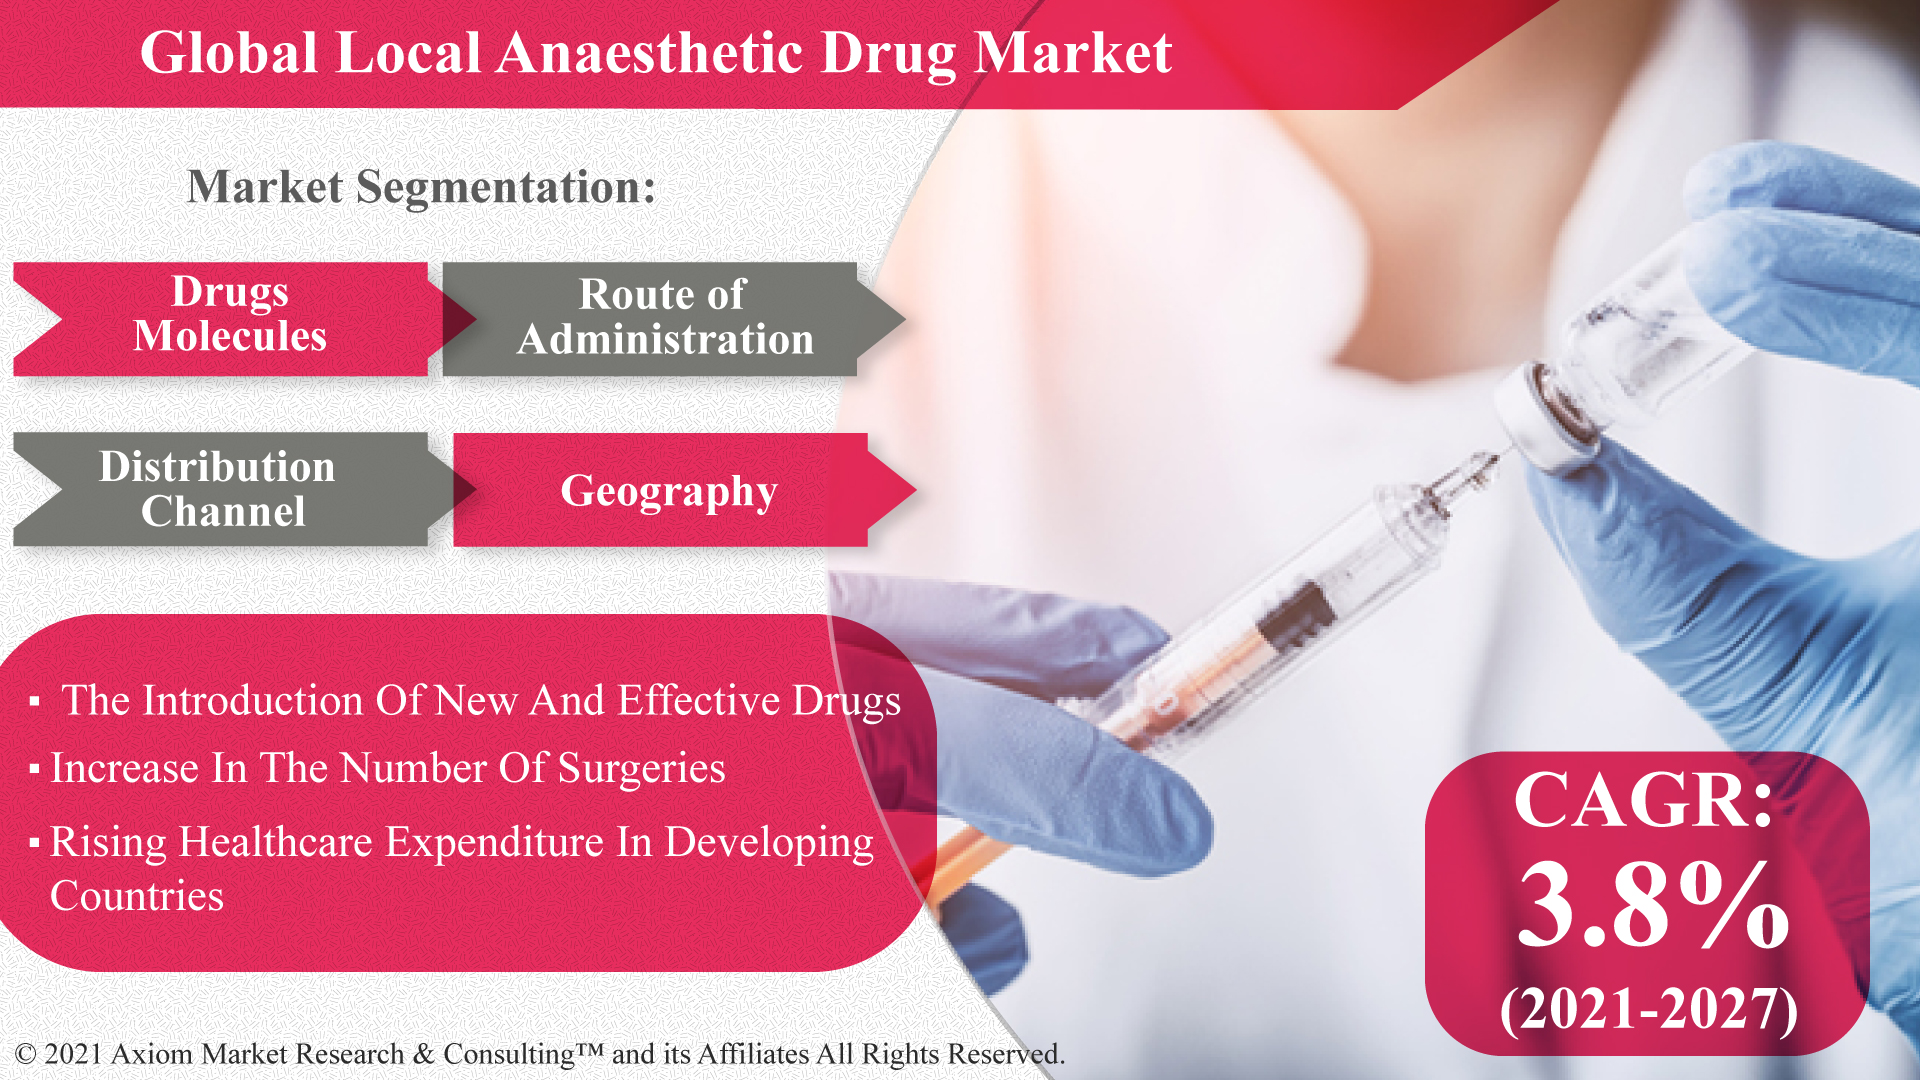 Global-Local-Anaesthetic-Drug-Market